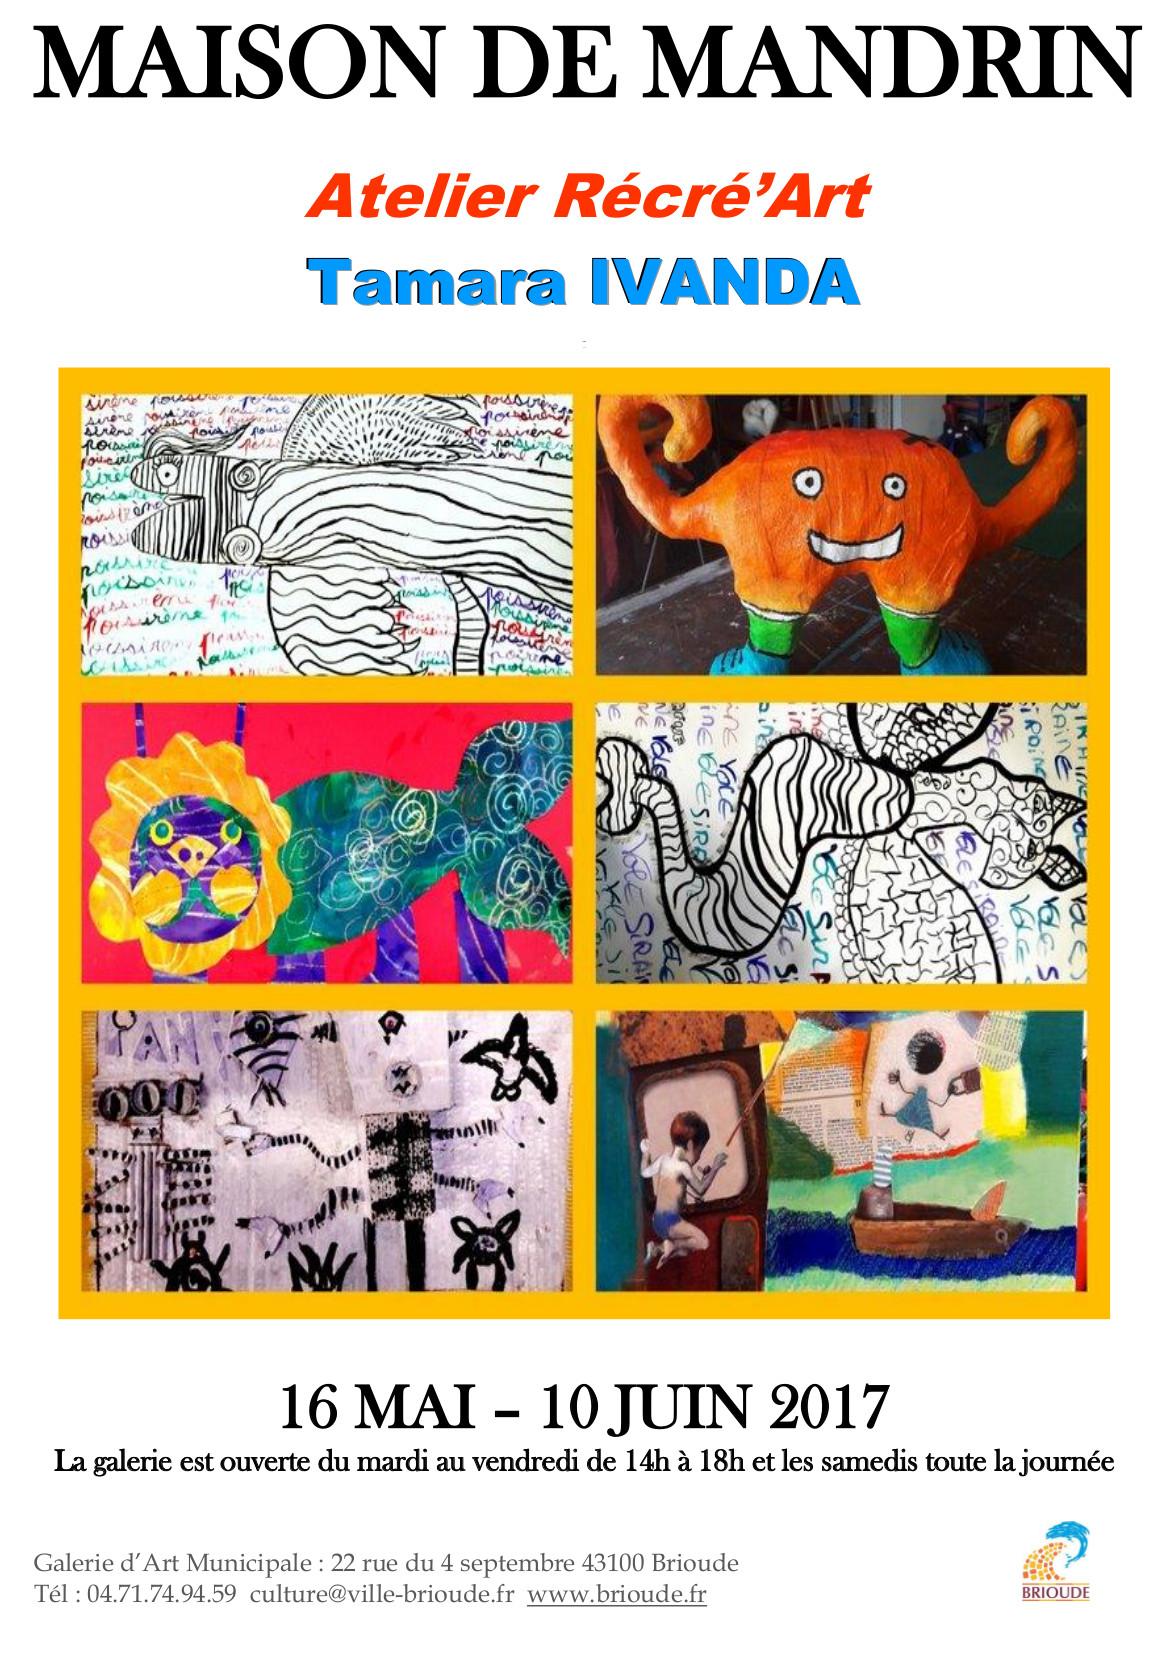 EXPOSITION MAISON DE MANDRIN :  ATELIER RECRE'ART